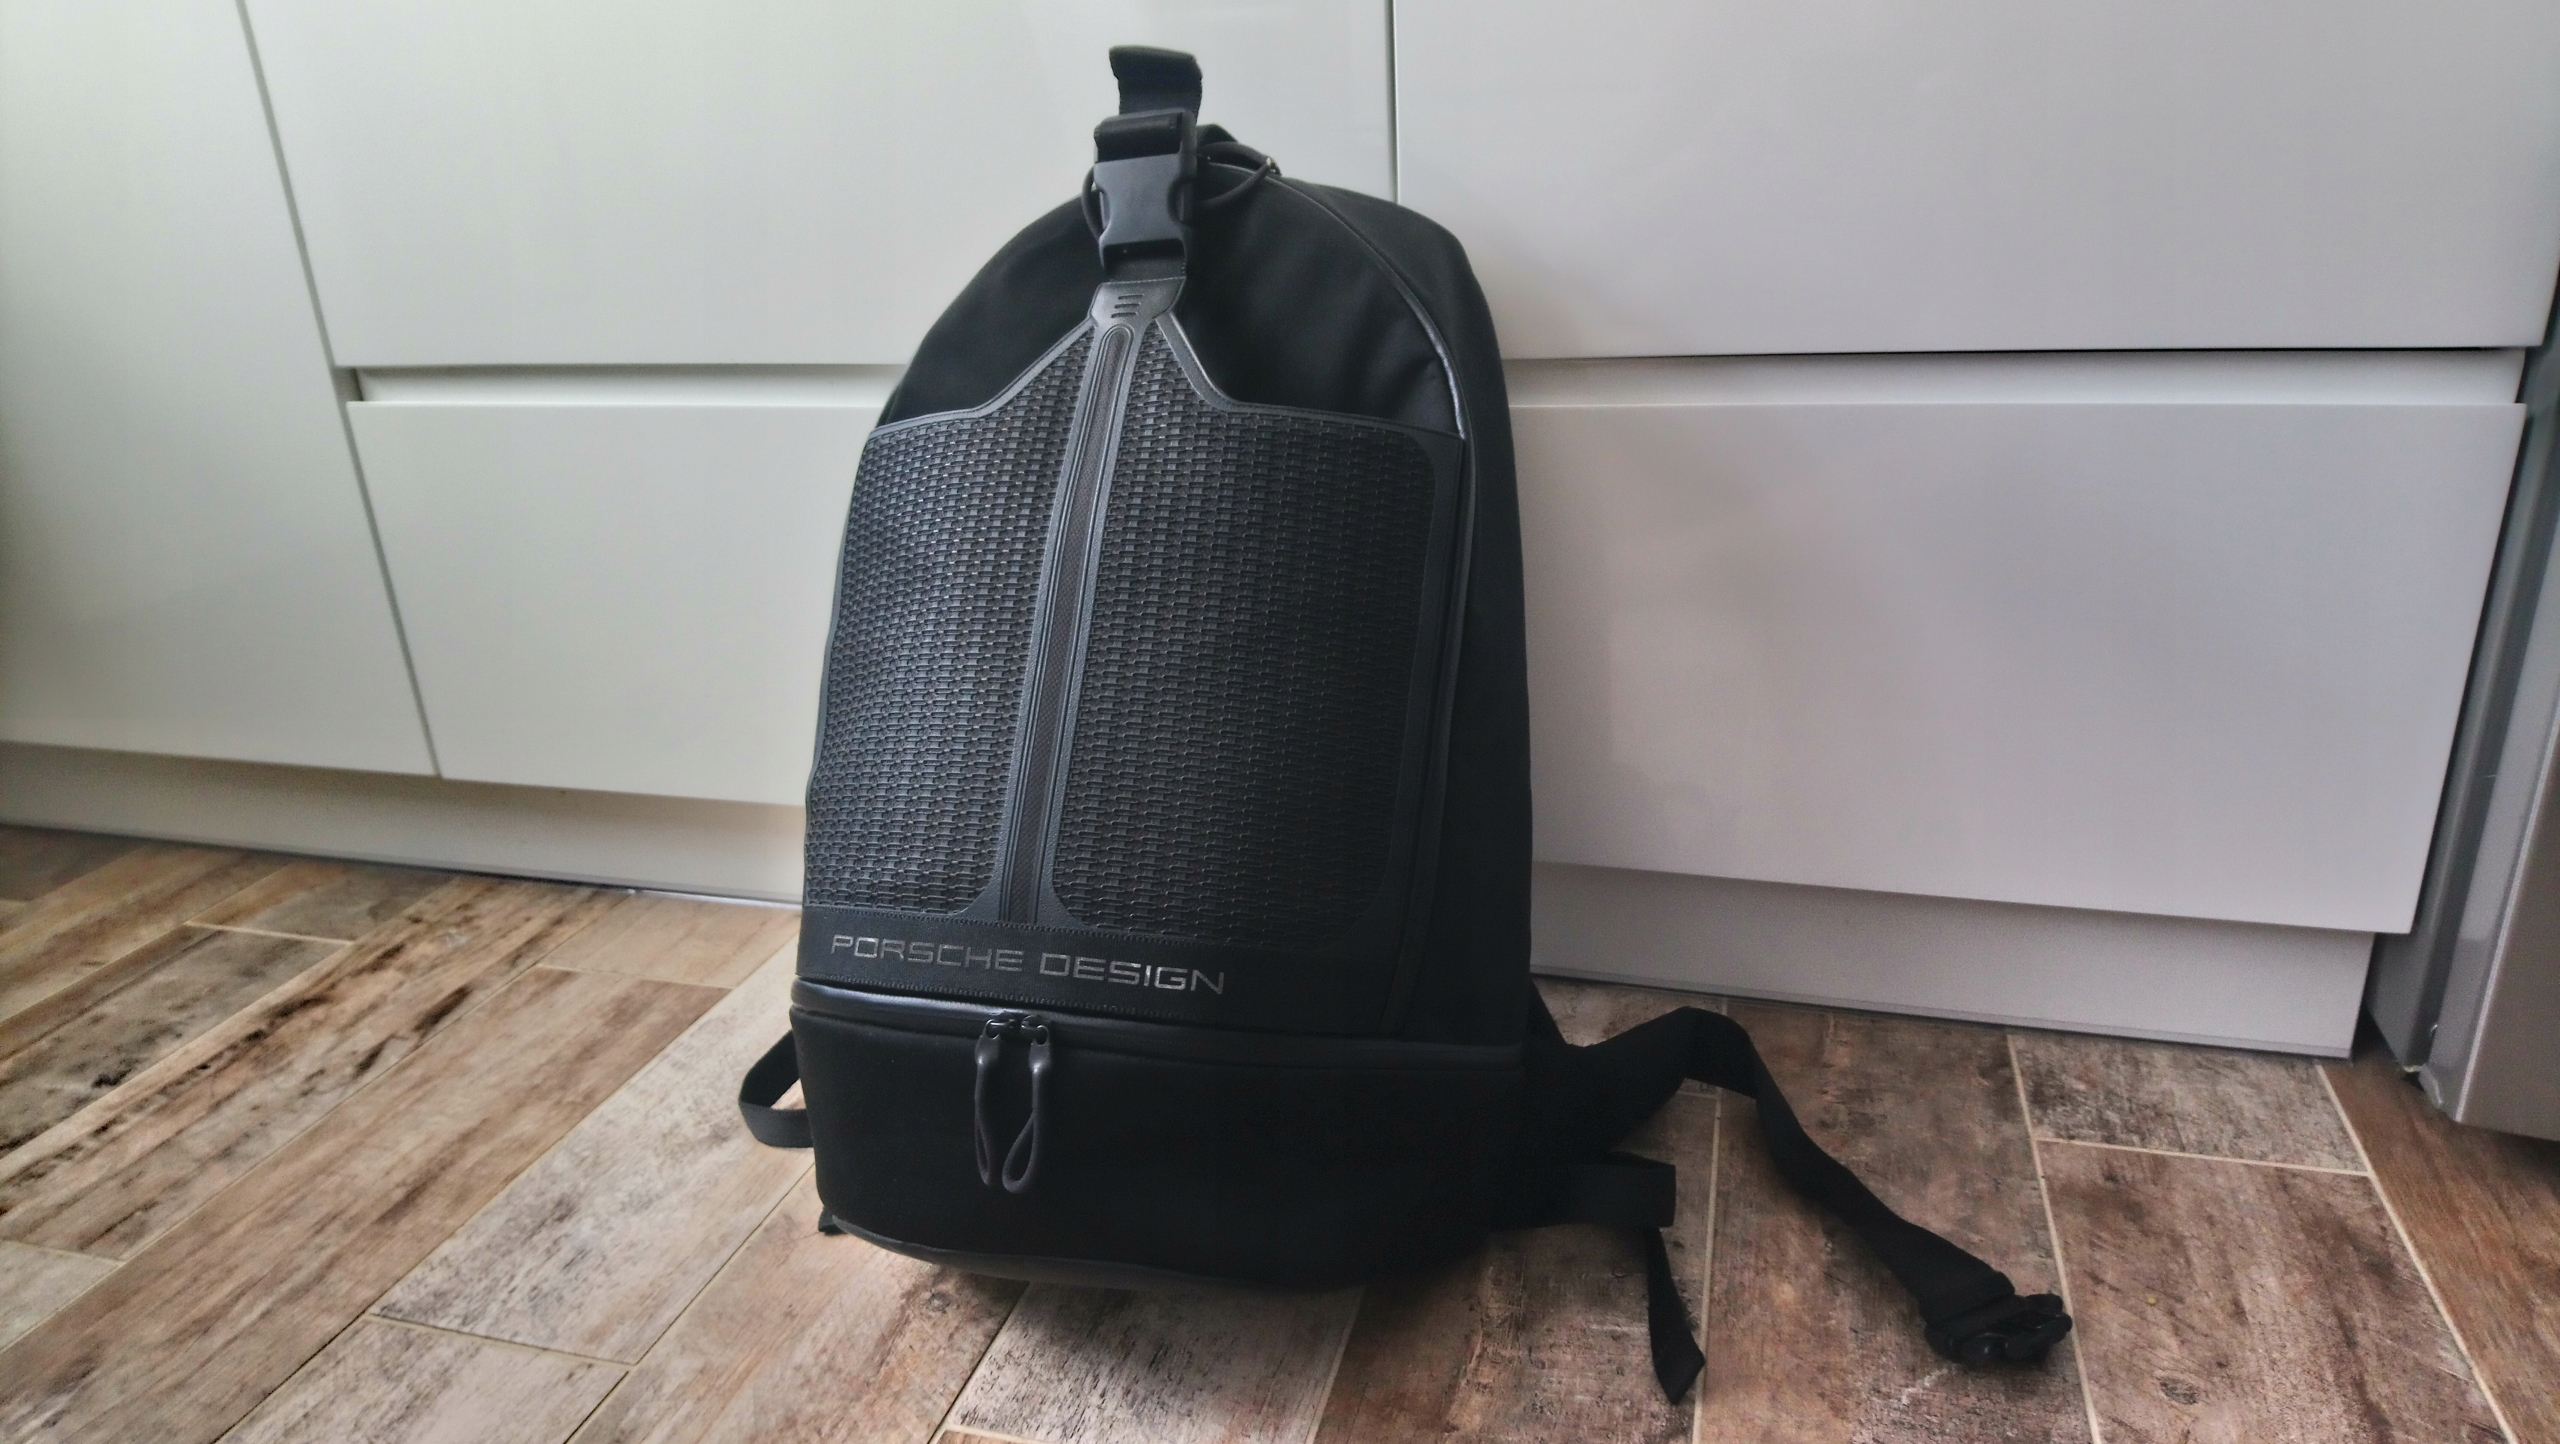 Oryginalny plecak PORSCHE DESIGN ADIDAS stan Ładny